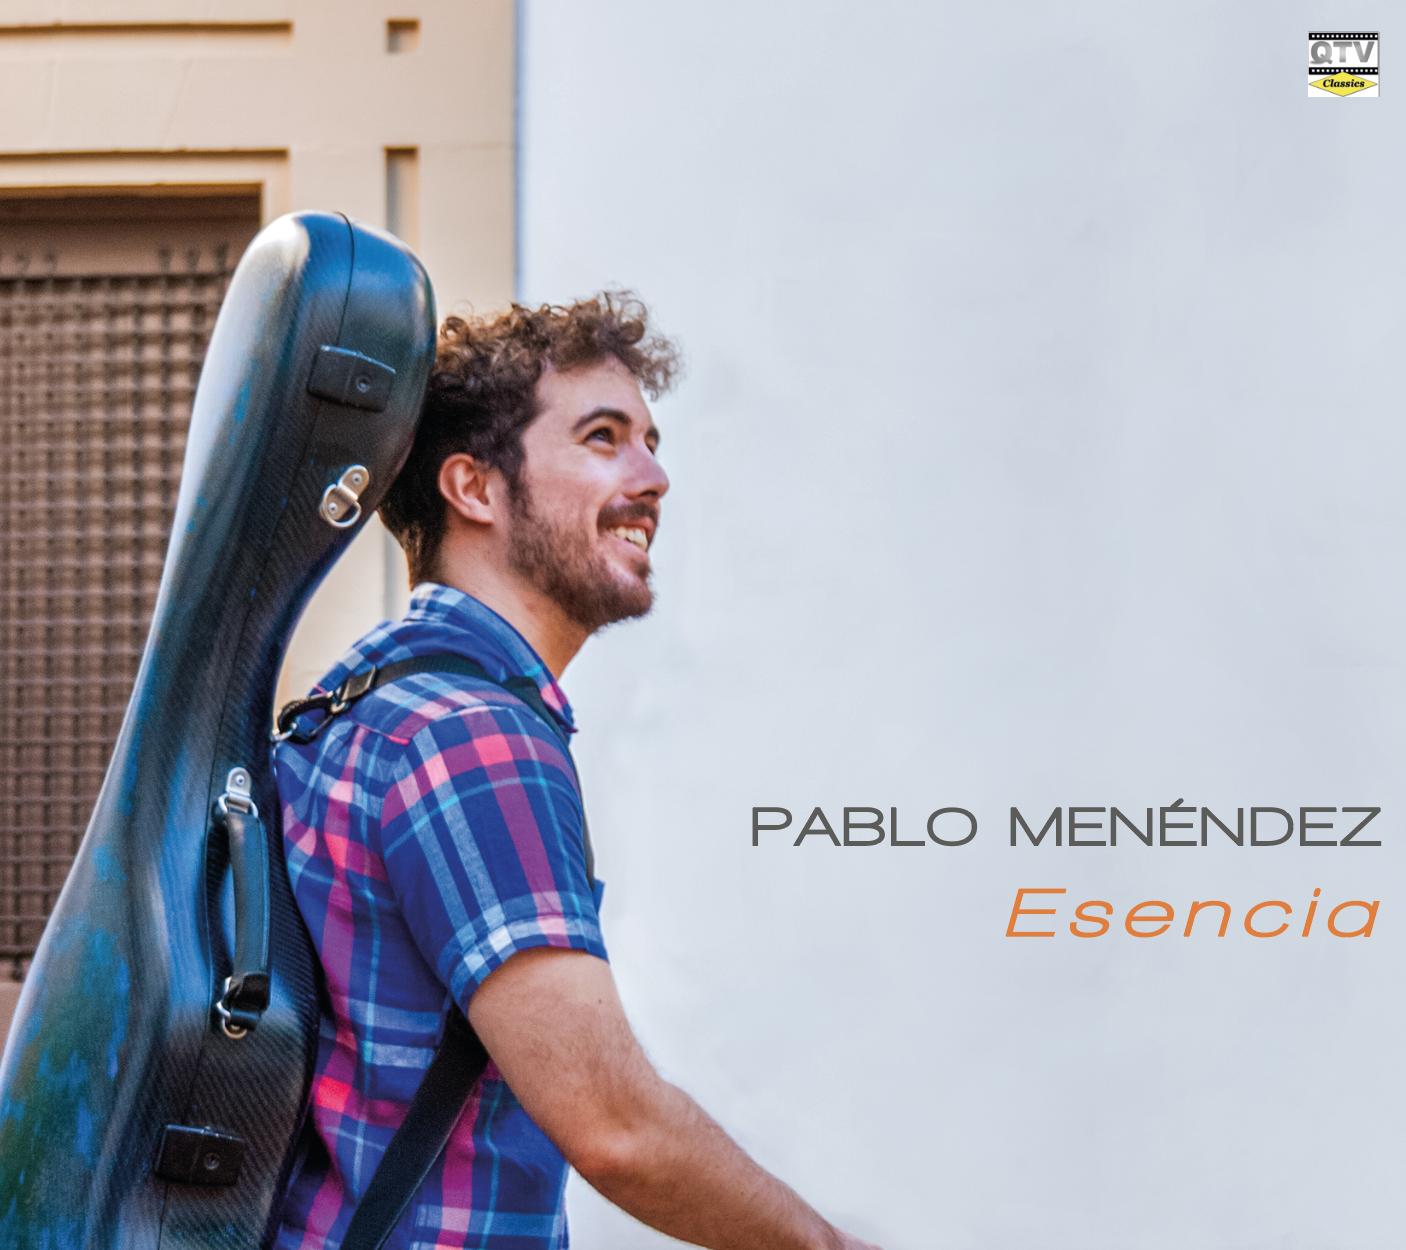 Esencia - Pablo Menéndez